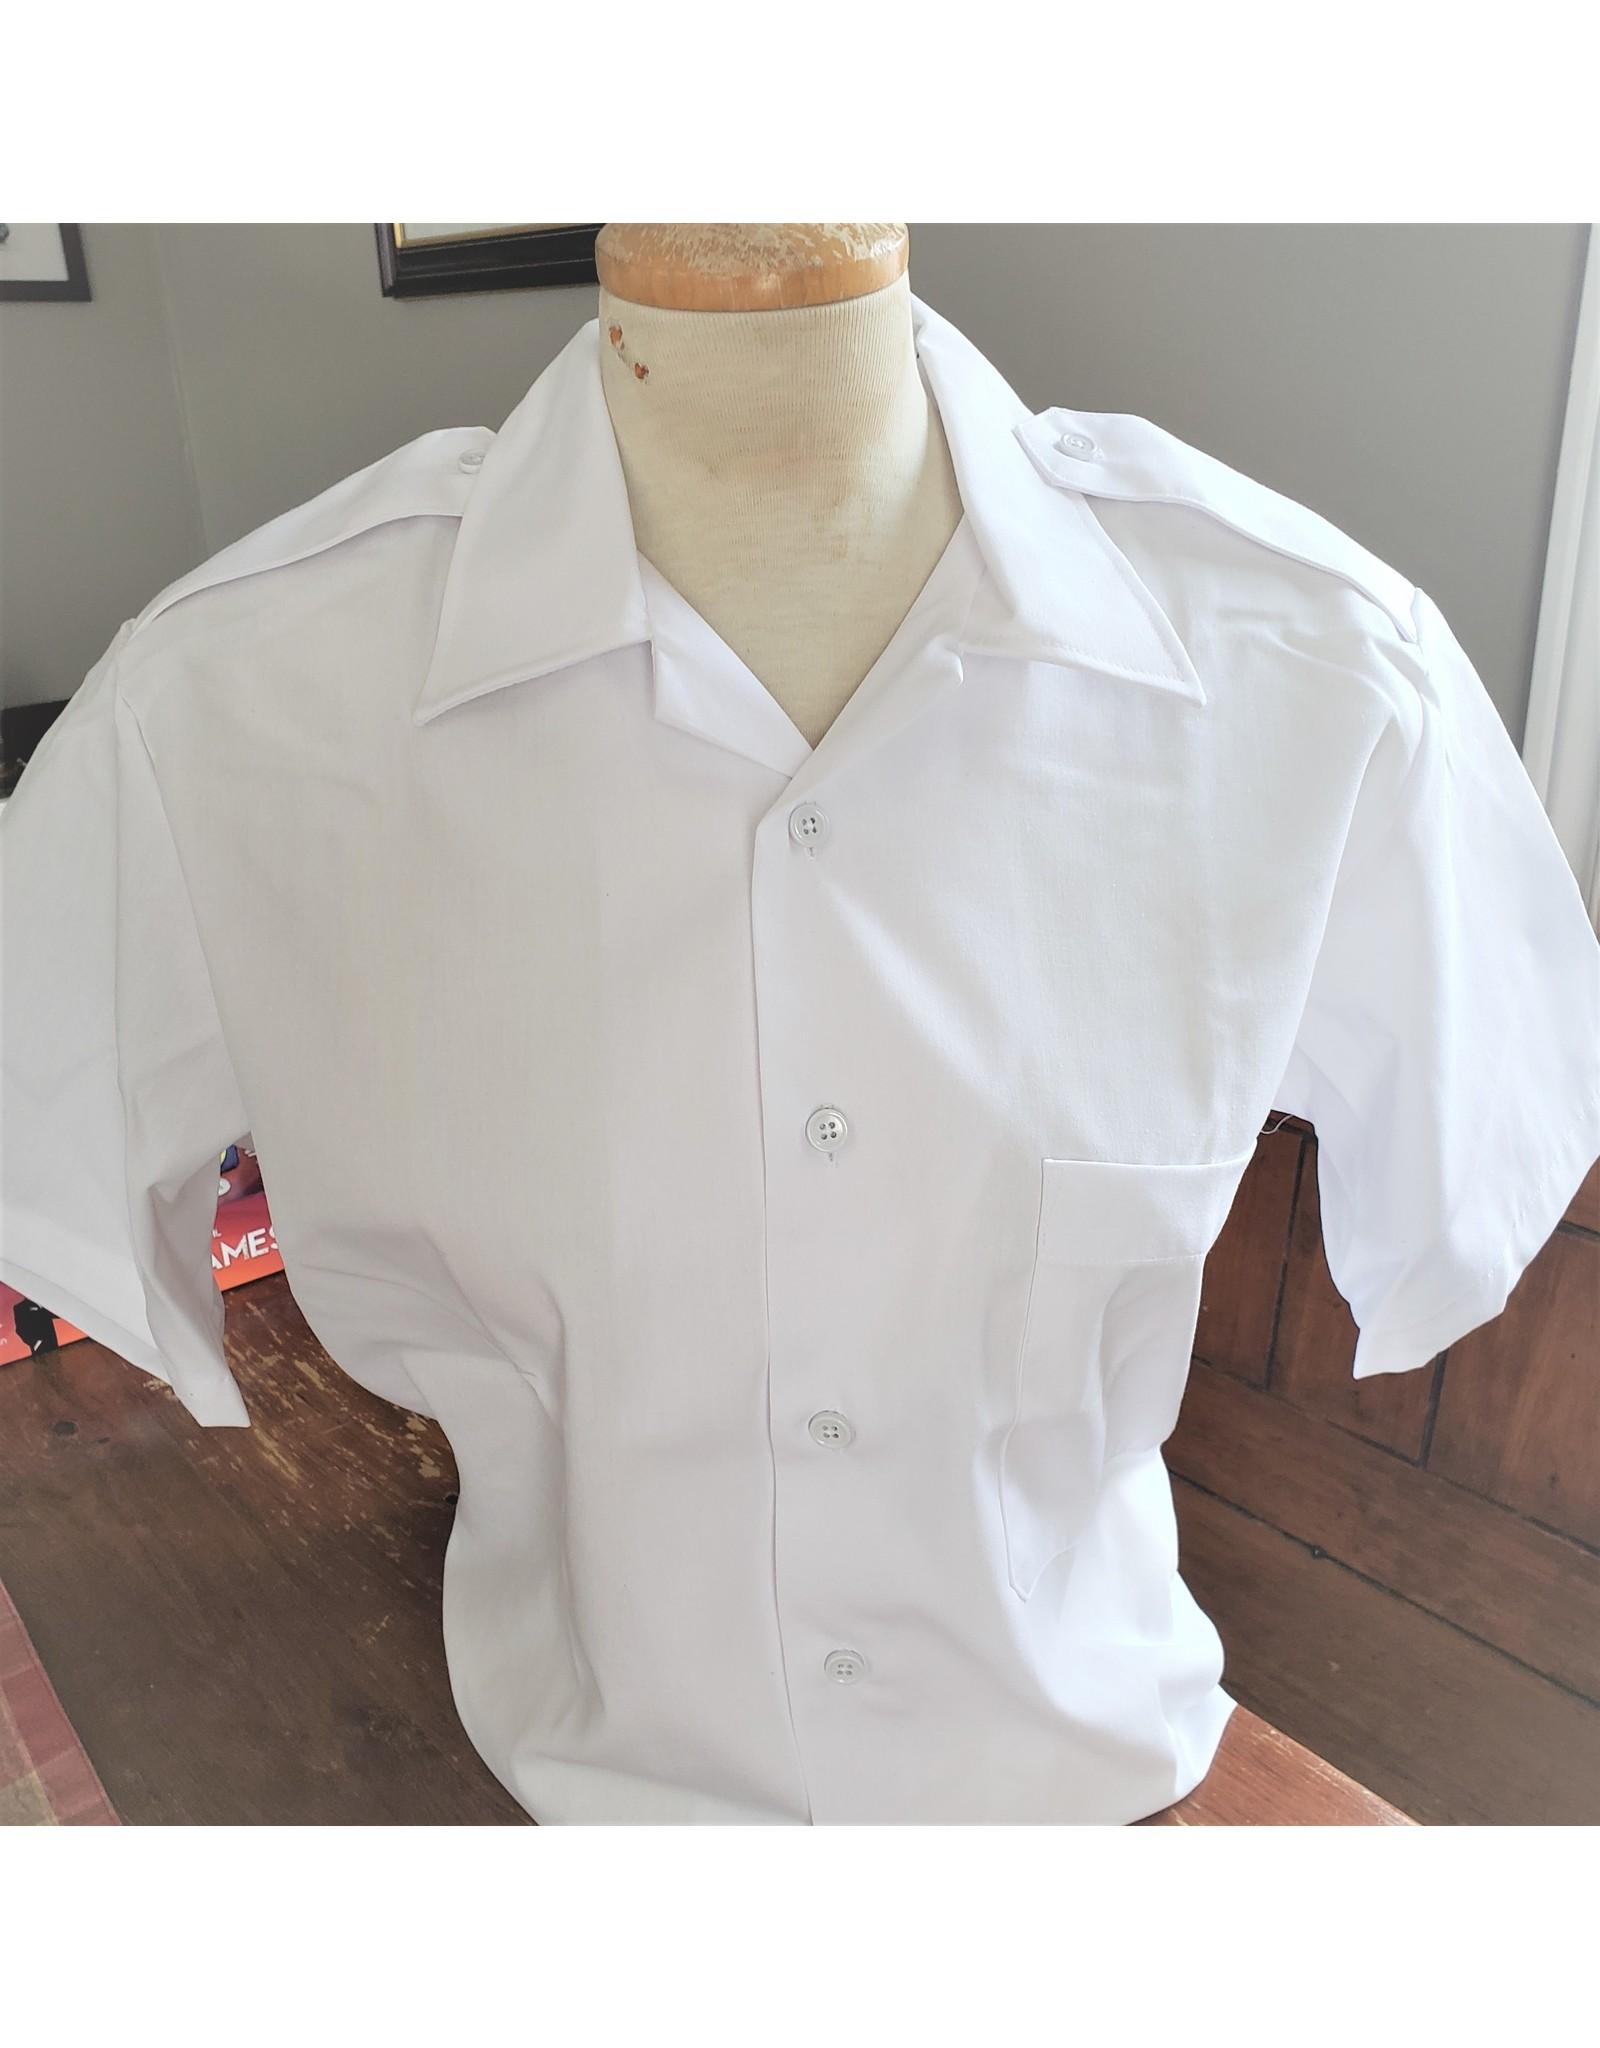 CANADIAN SURPLUS MEN'S WHITE DRESS SHIRT SHORT SLEEVE-USED